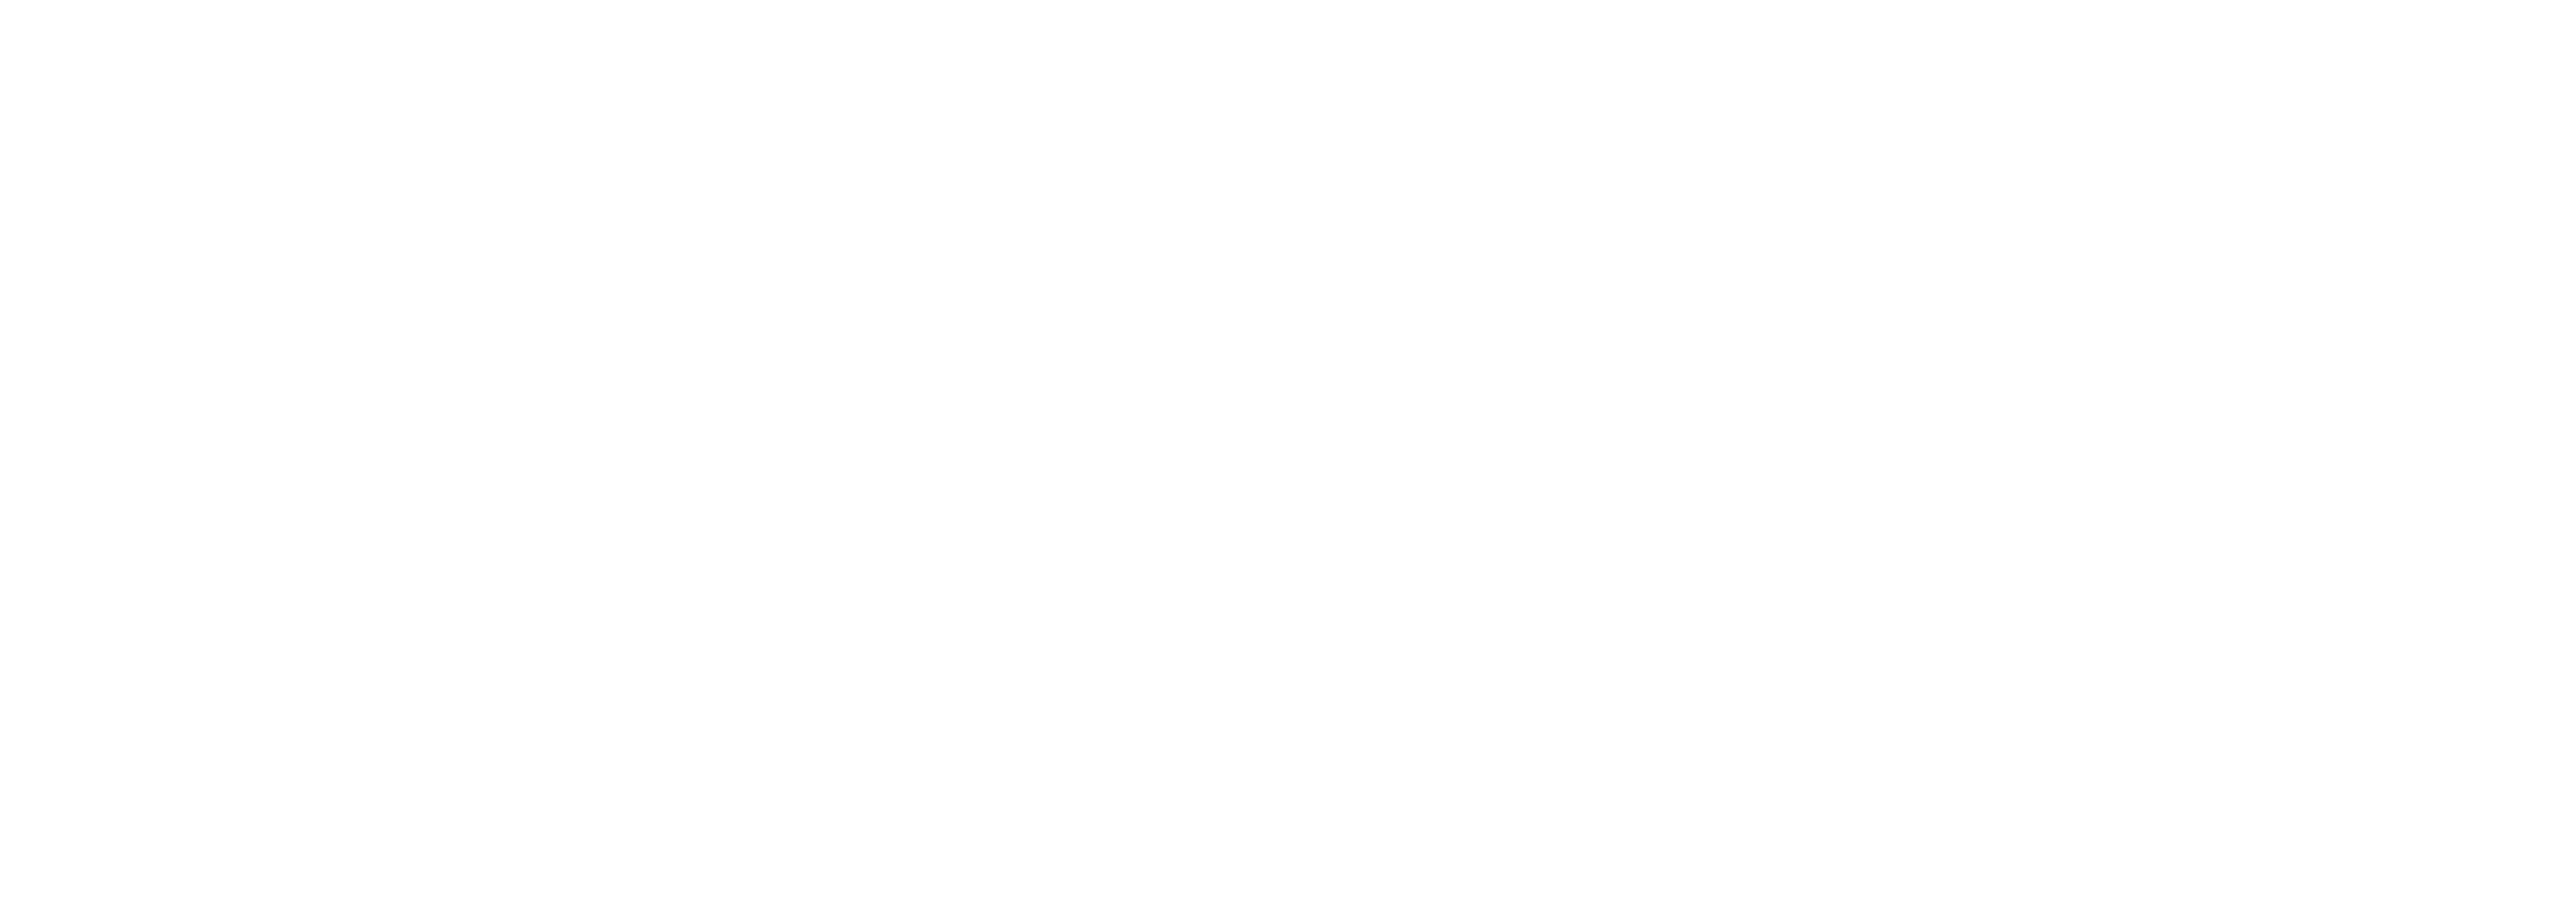 Istruzioni brewing syphon